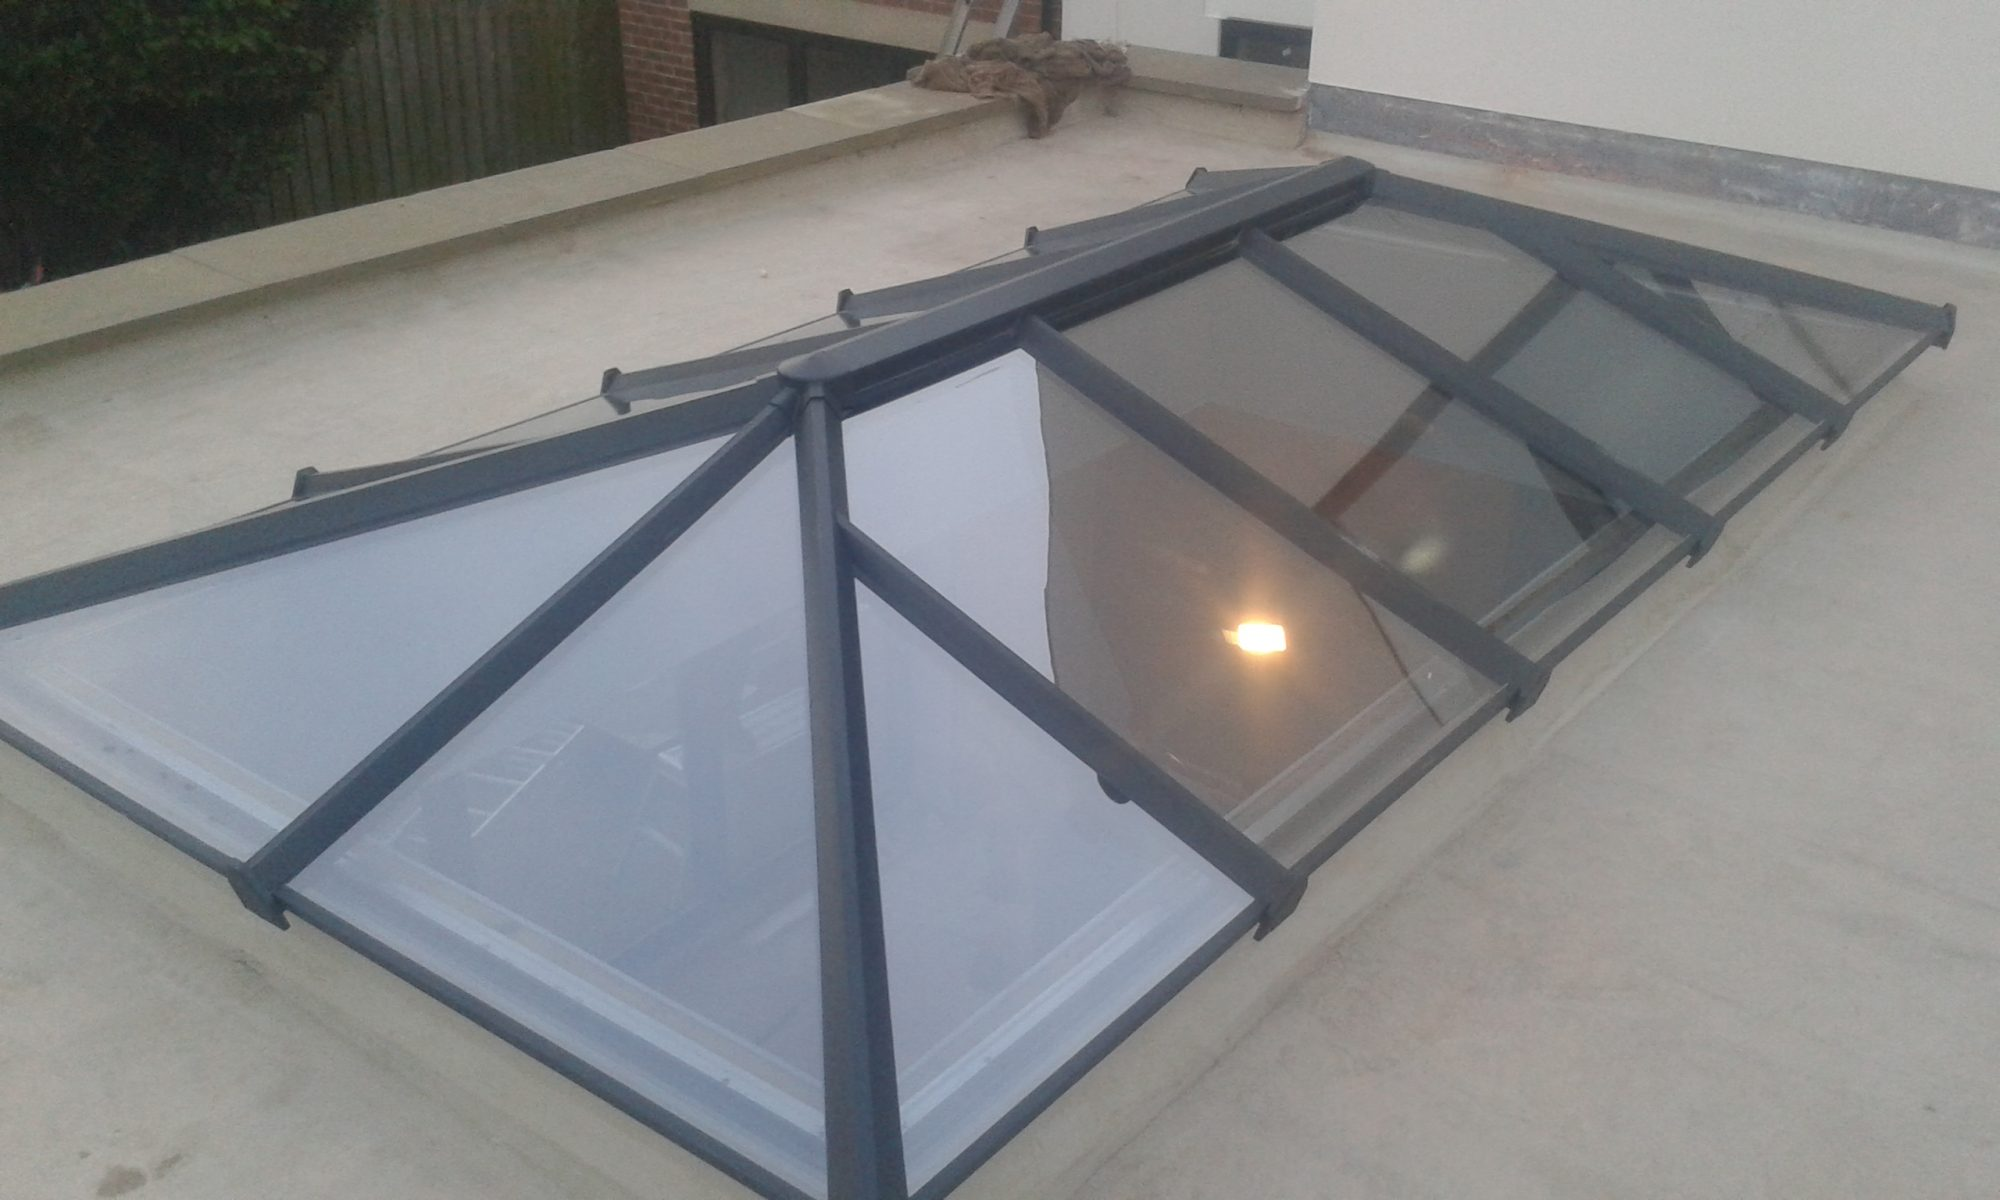 Skypod Roof Lantern - Anthracite Grey Exterior